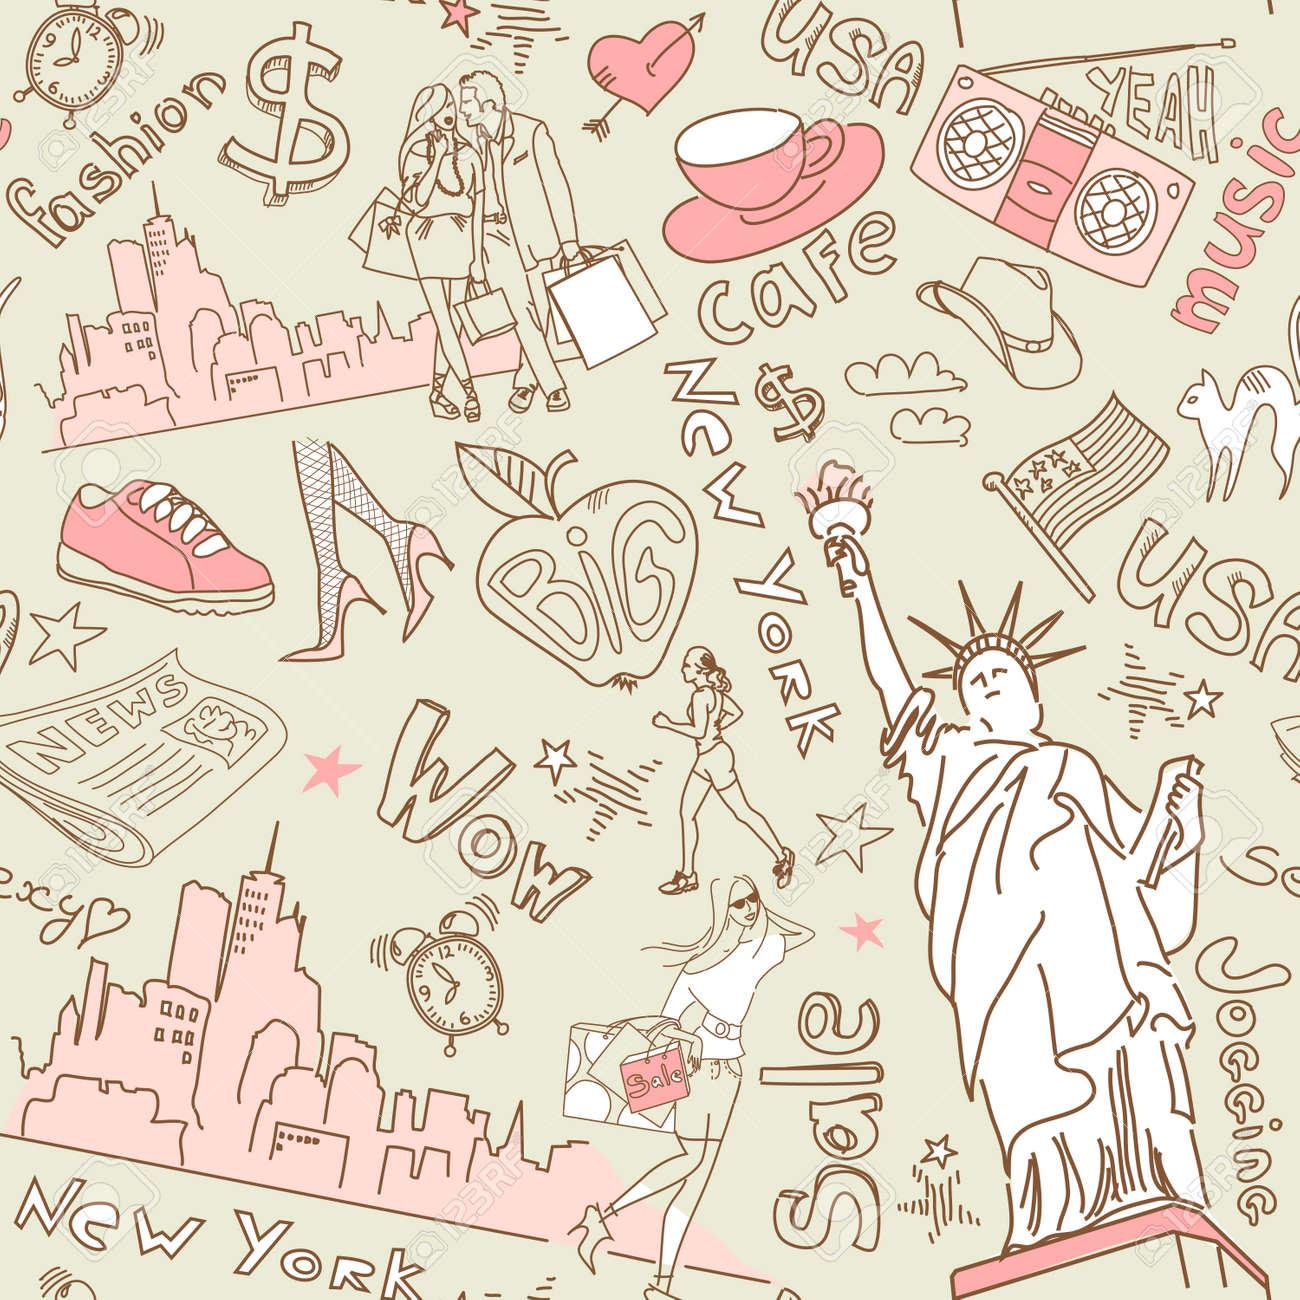 New York seamless doodles pattern Stock Vector - 25077093